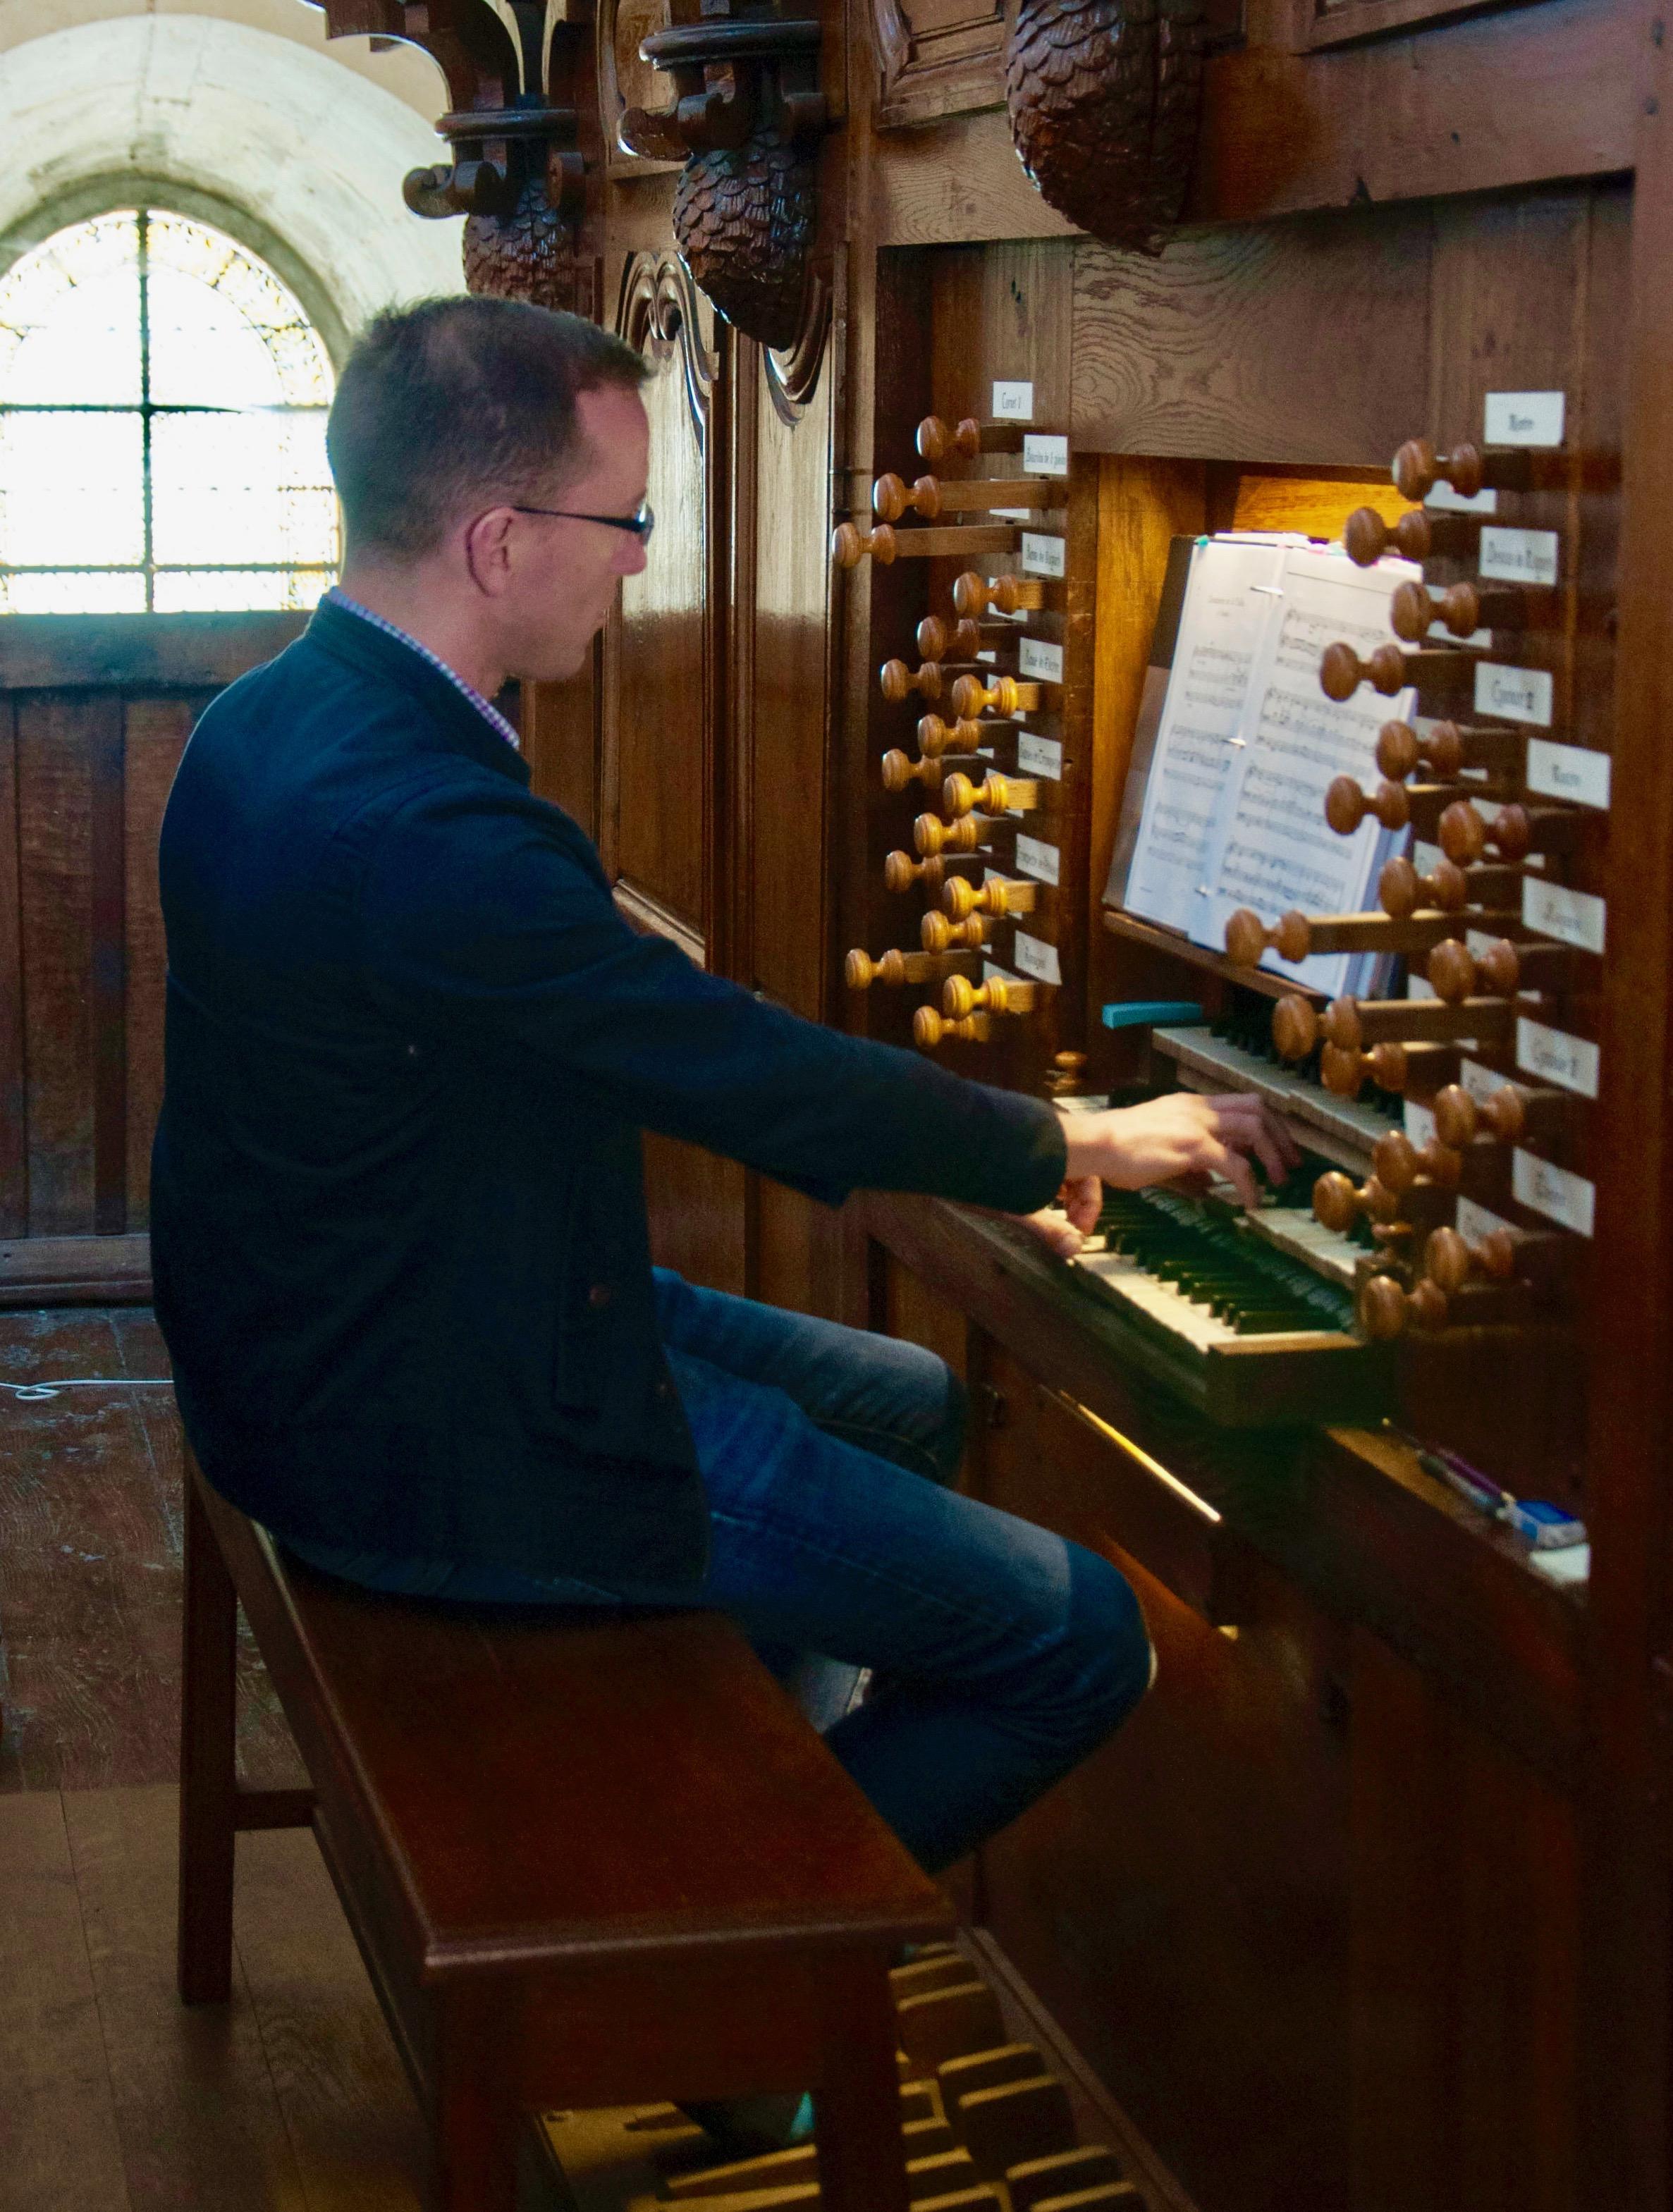 Christian Lane playing the organ at Rozay-en-Brie